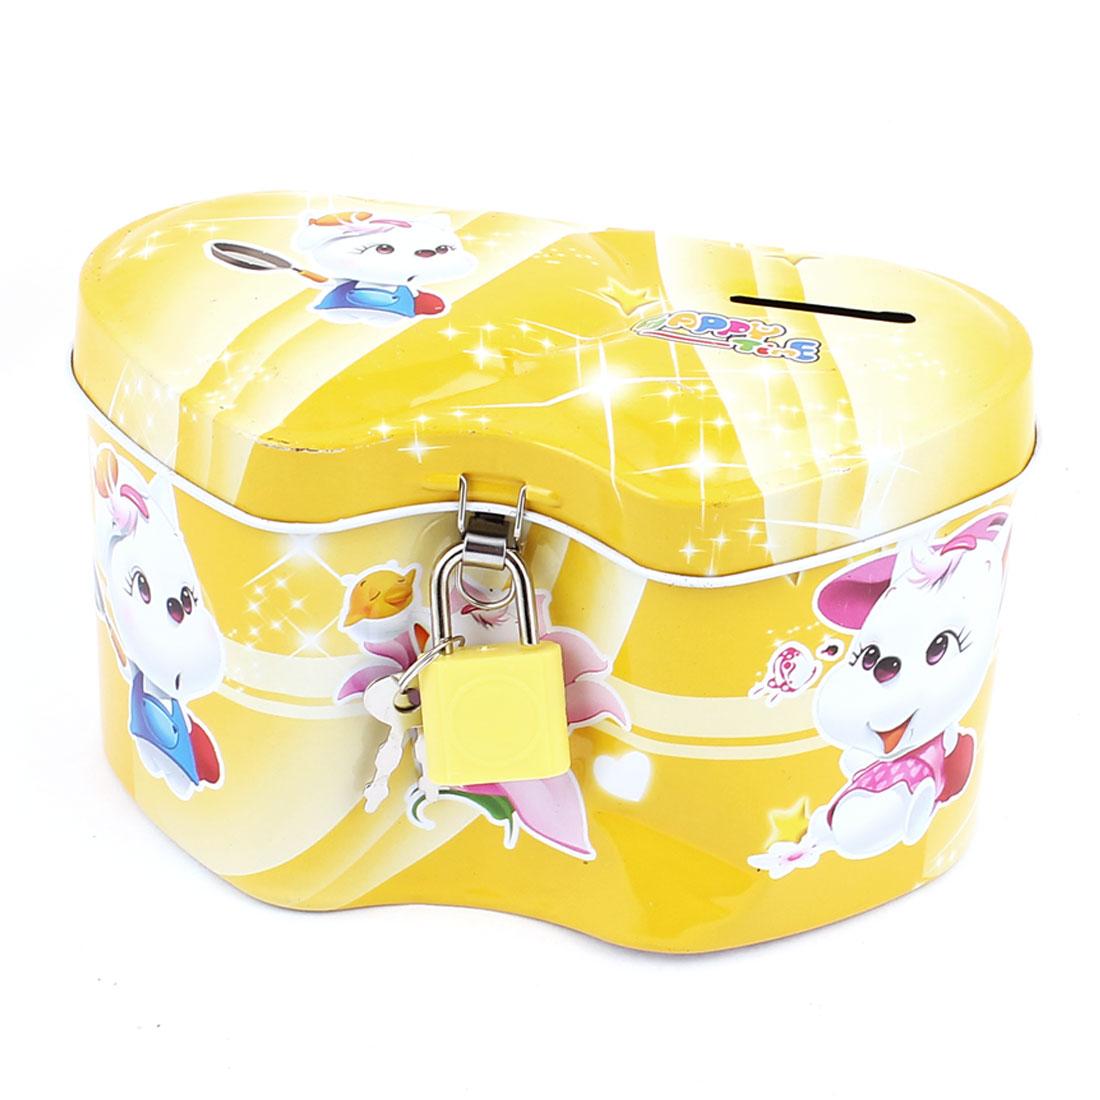 Cartoon Heart Pig Print Metal Coin Money Saving Piggy Bank Box Case Yellow w Lock